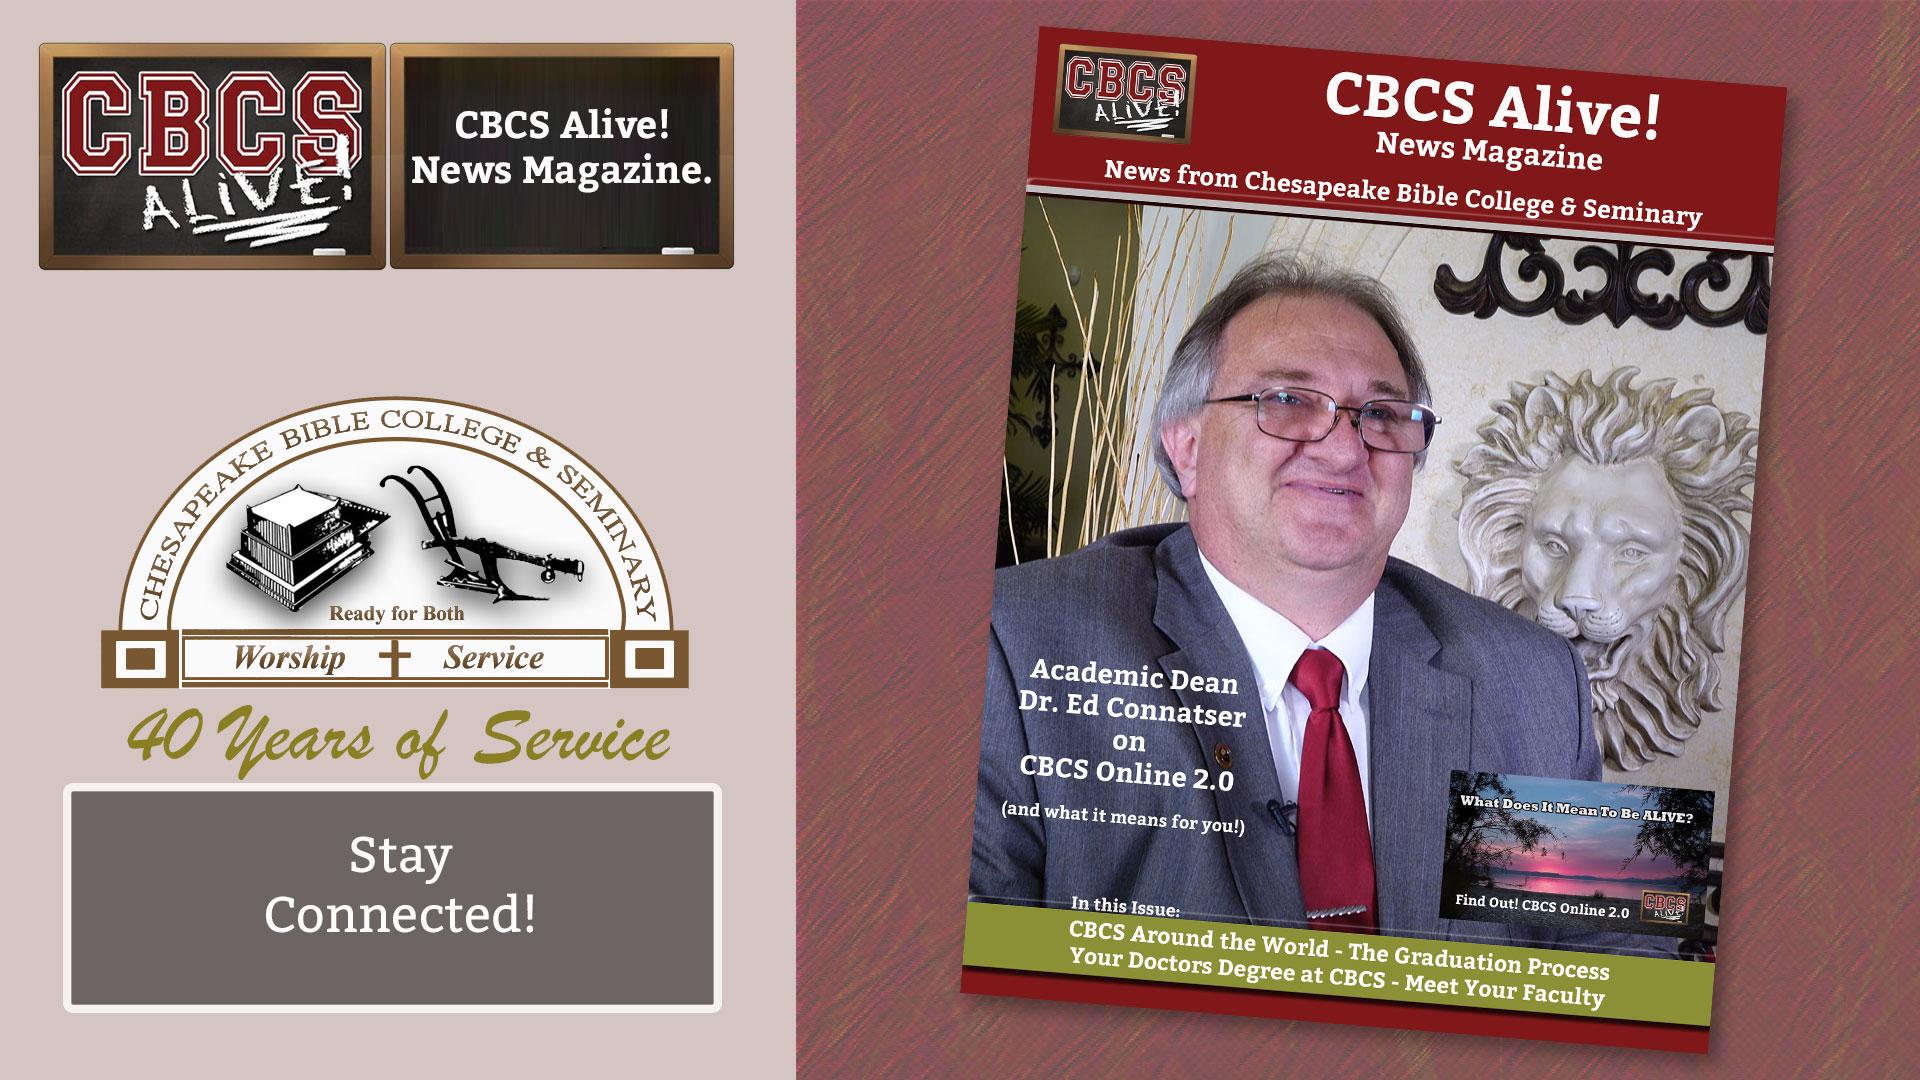 CBCS Alive! News Magazine